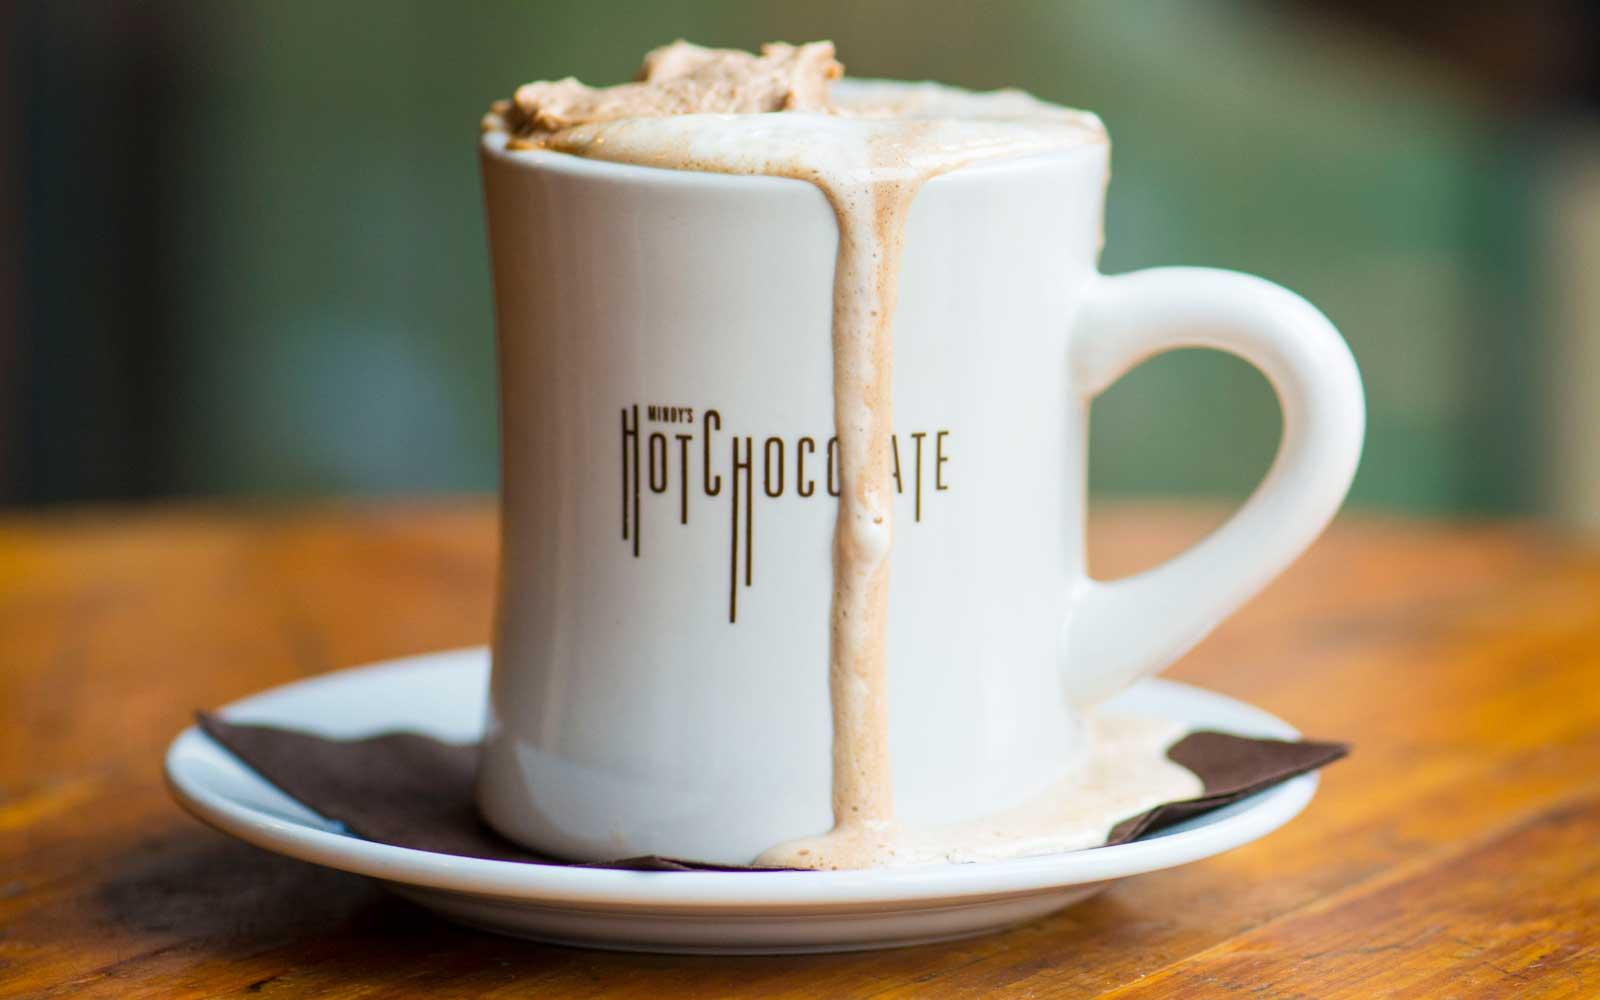 Best Hot Chocolate - Mindy's HotChocolate Chicago